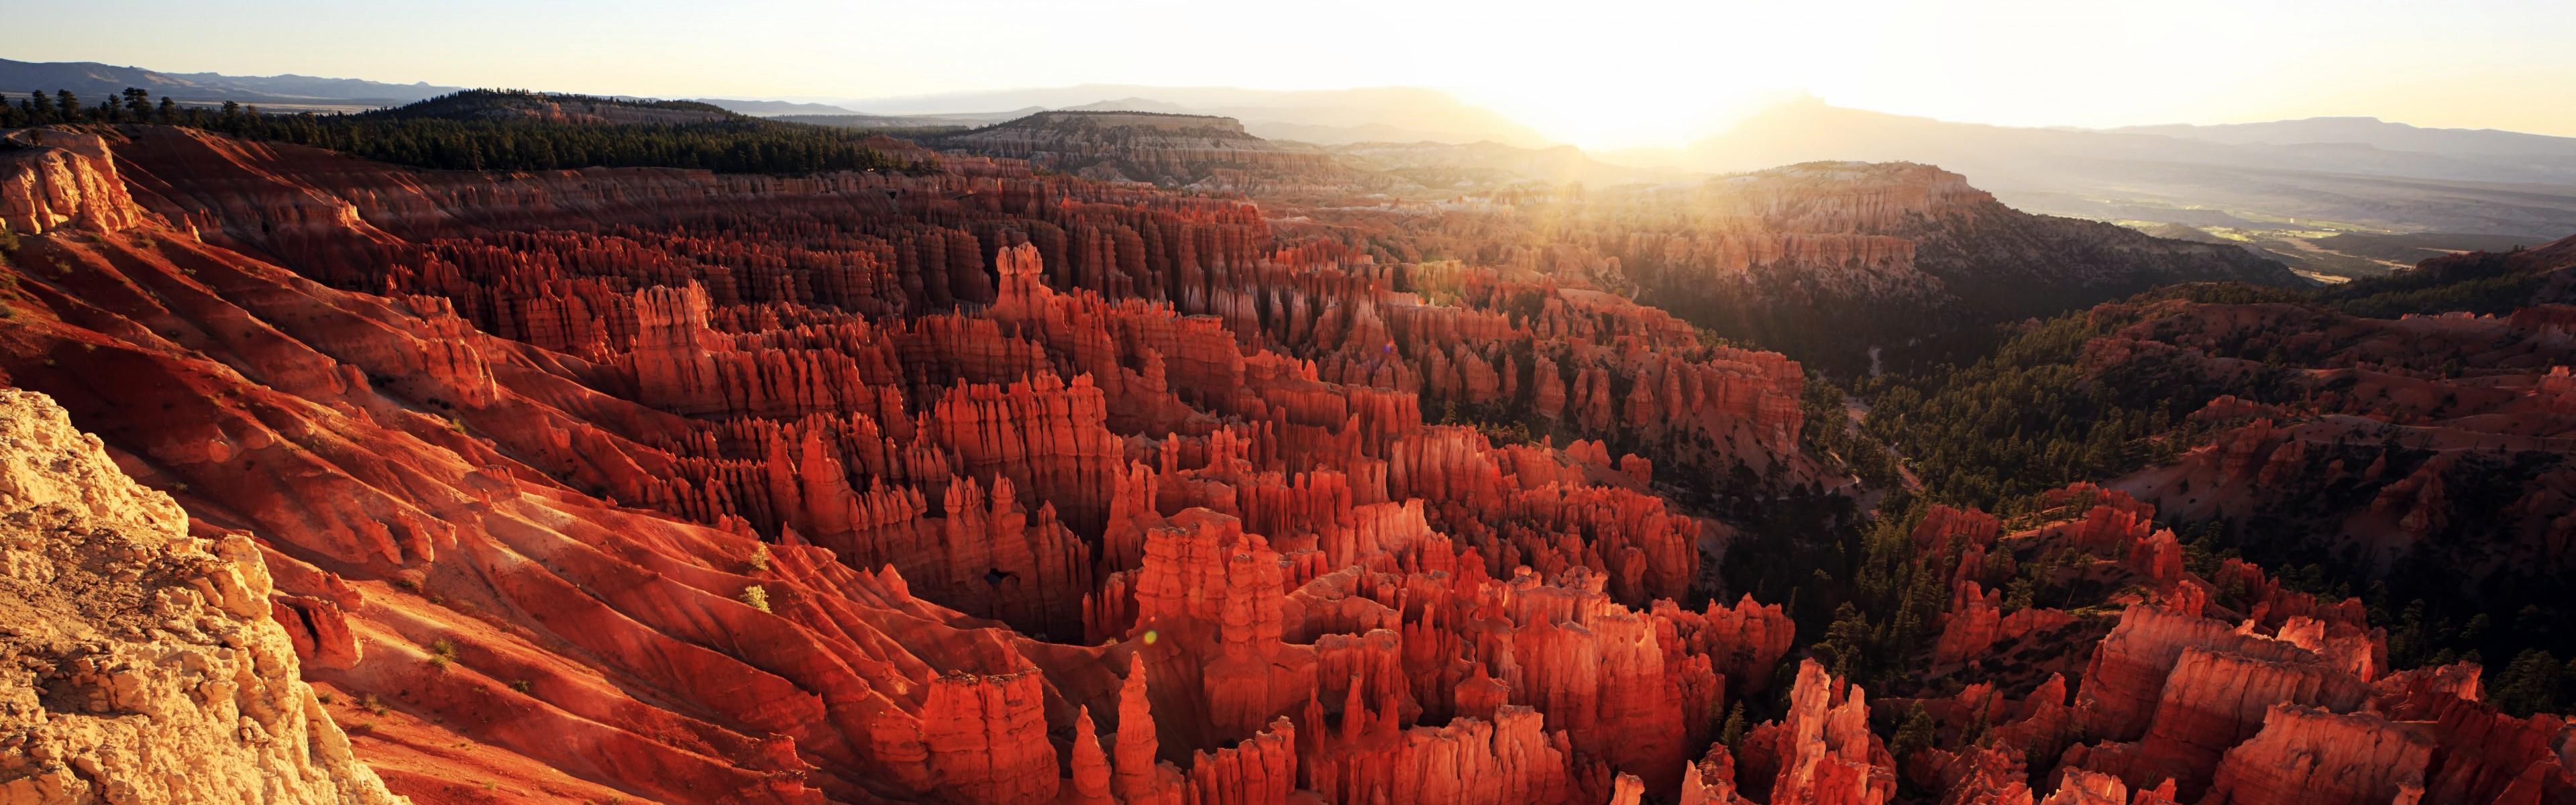 Bryce Canyon Rocks National Park Utah Panorama Wallpapers